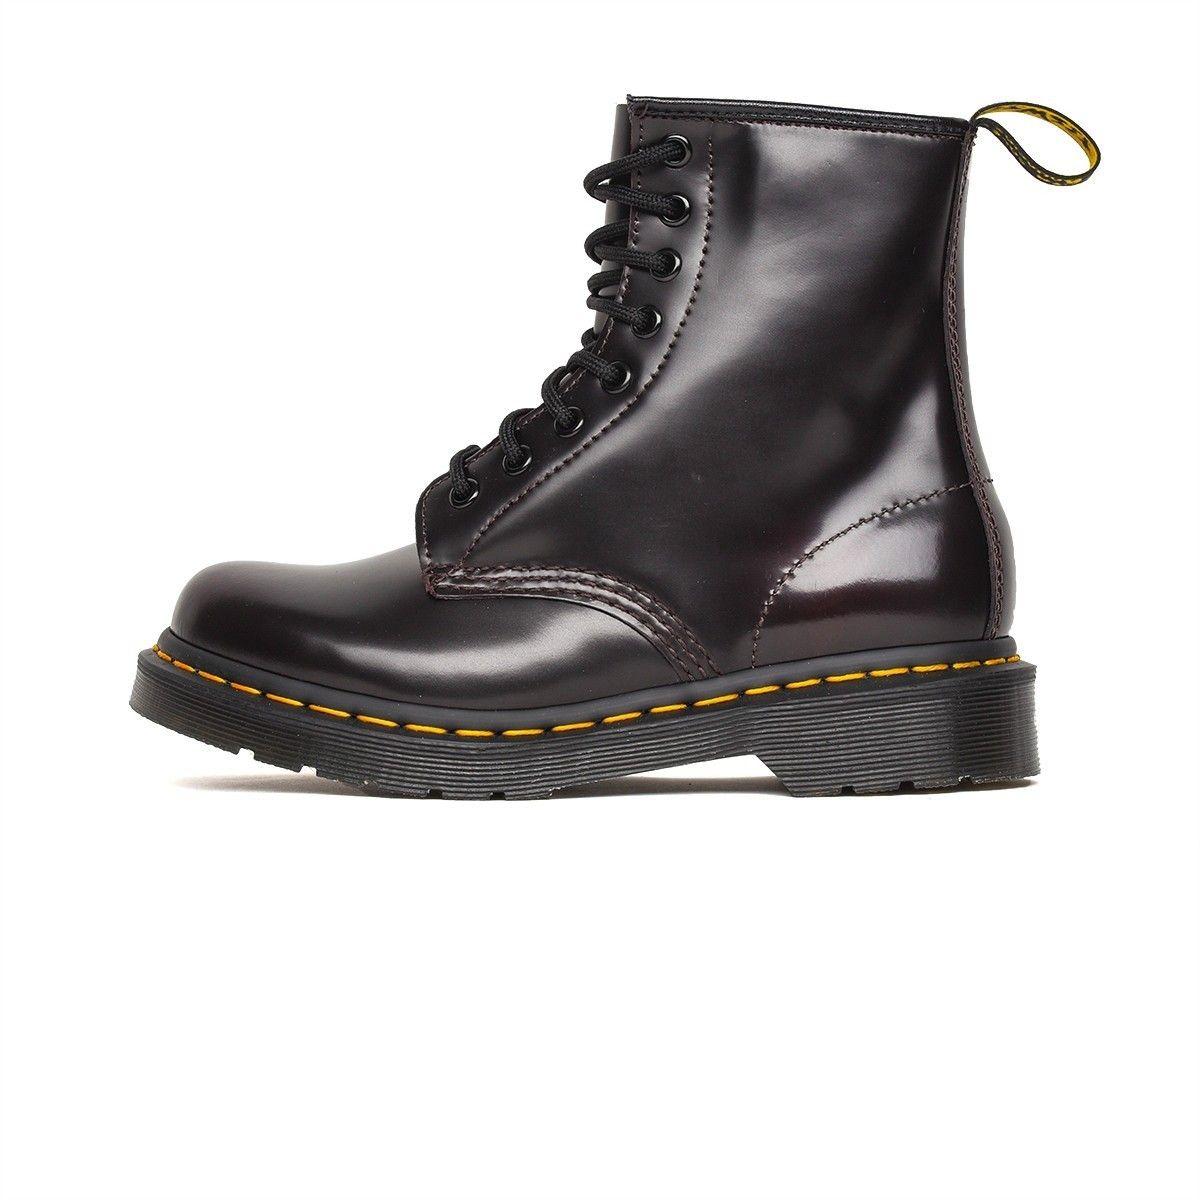 Dr Martens Boots Dr. Martens 1460 Arcadia Cherry Red -  13661601-1460CHERYREDA. Loading zoom 96e99f8d0266